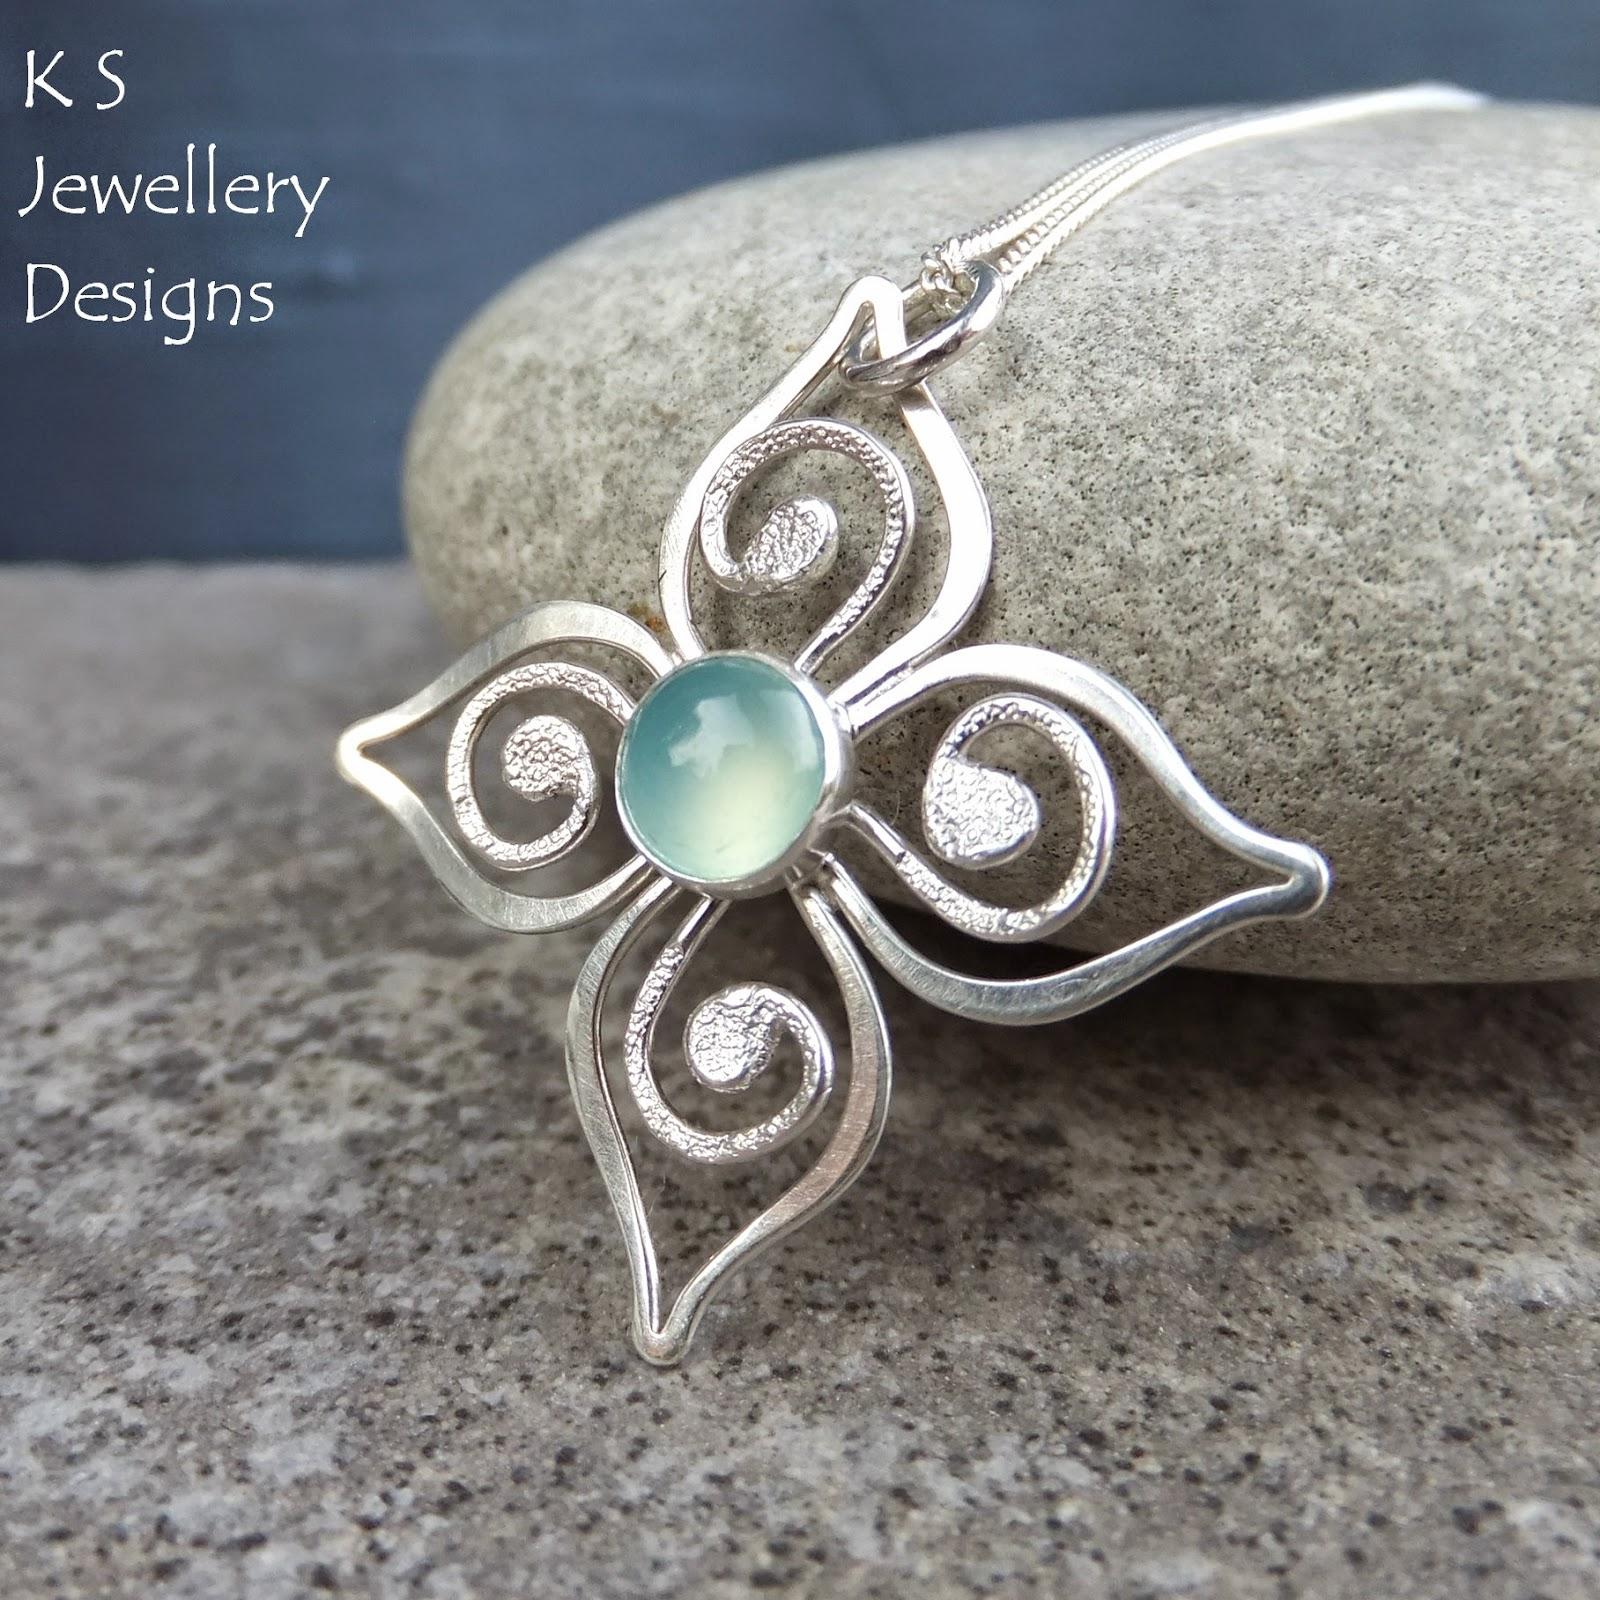 http://ksjewellerydesigns.co.uk/ourshop/prod_3583972-Aqua-Chalcedony-Sterling-Silver-Flower-Pendant-Swirl-Blossom.html